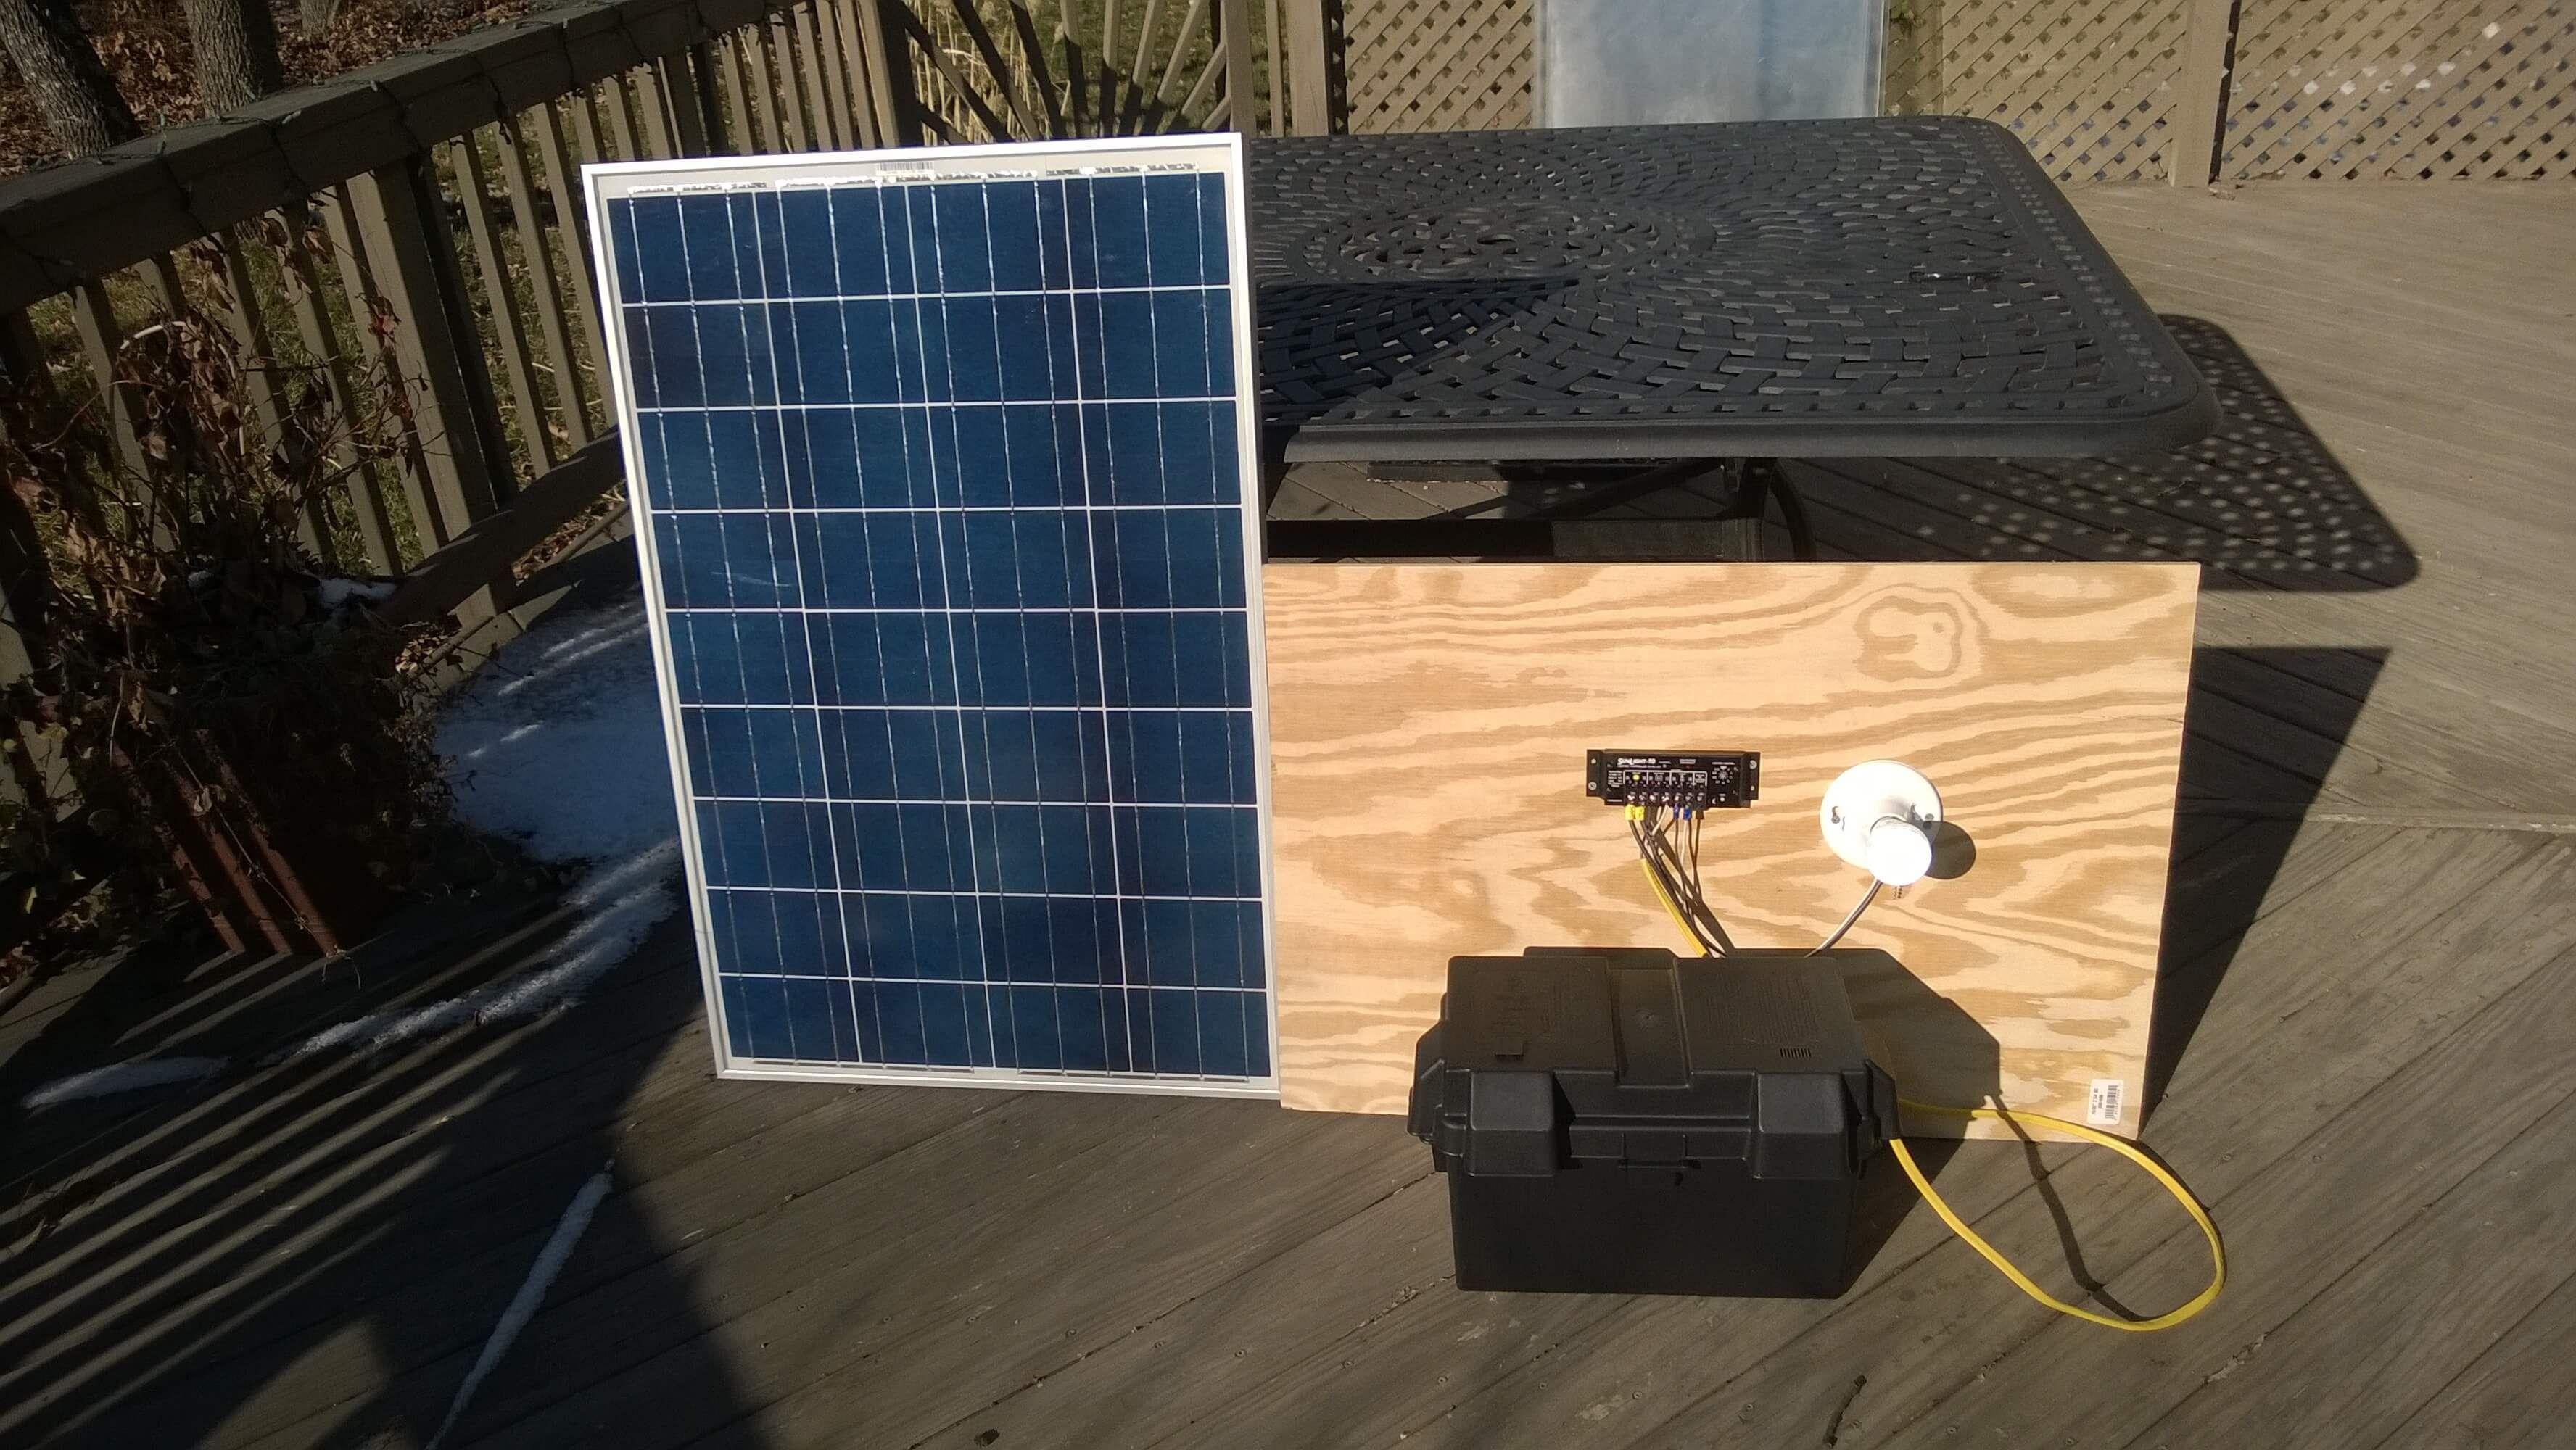 do it yourself solar lights garden pinterest best diy solar for your home images on diy solar homemade solar panels and do it yourself projects